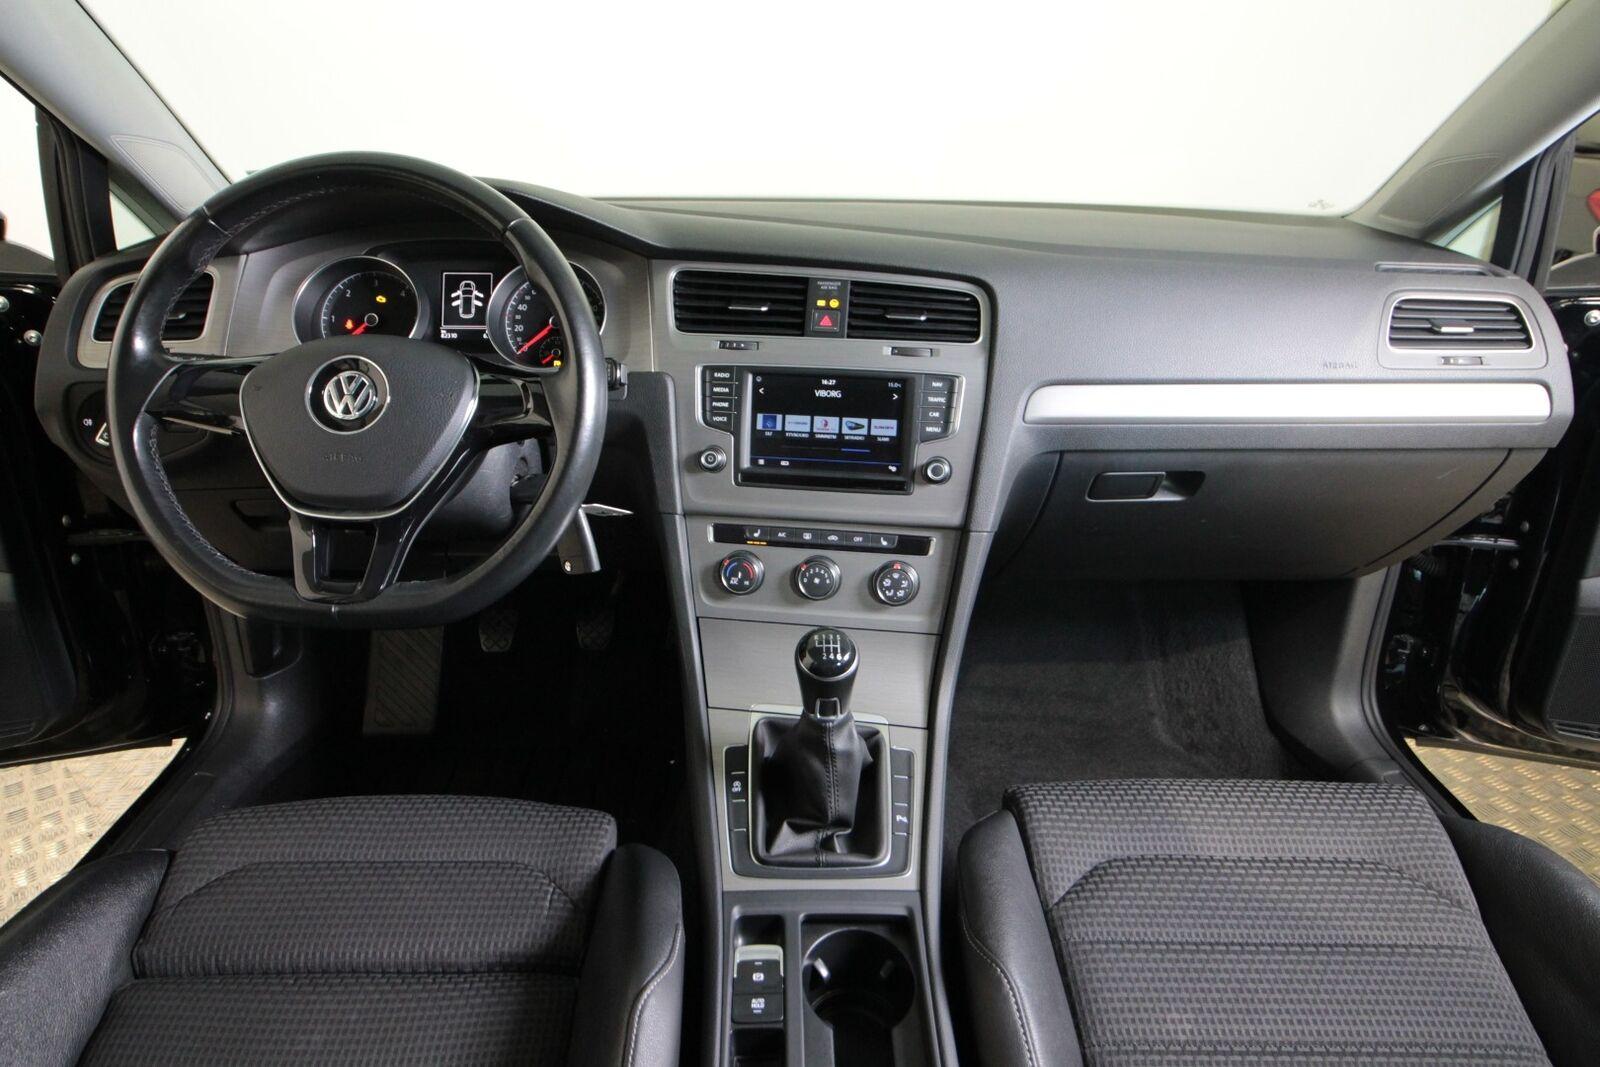 VW Golf VII TDi 150 Comfortl. Variant